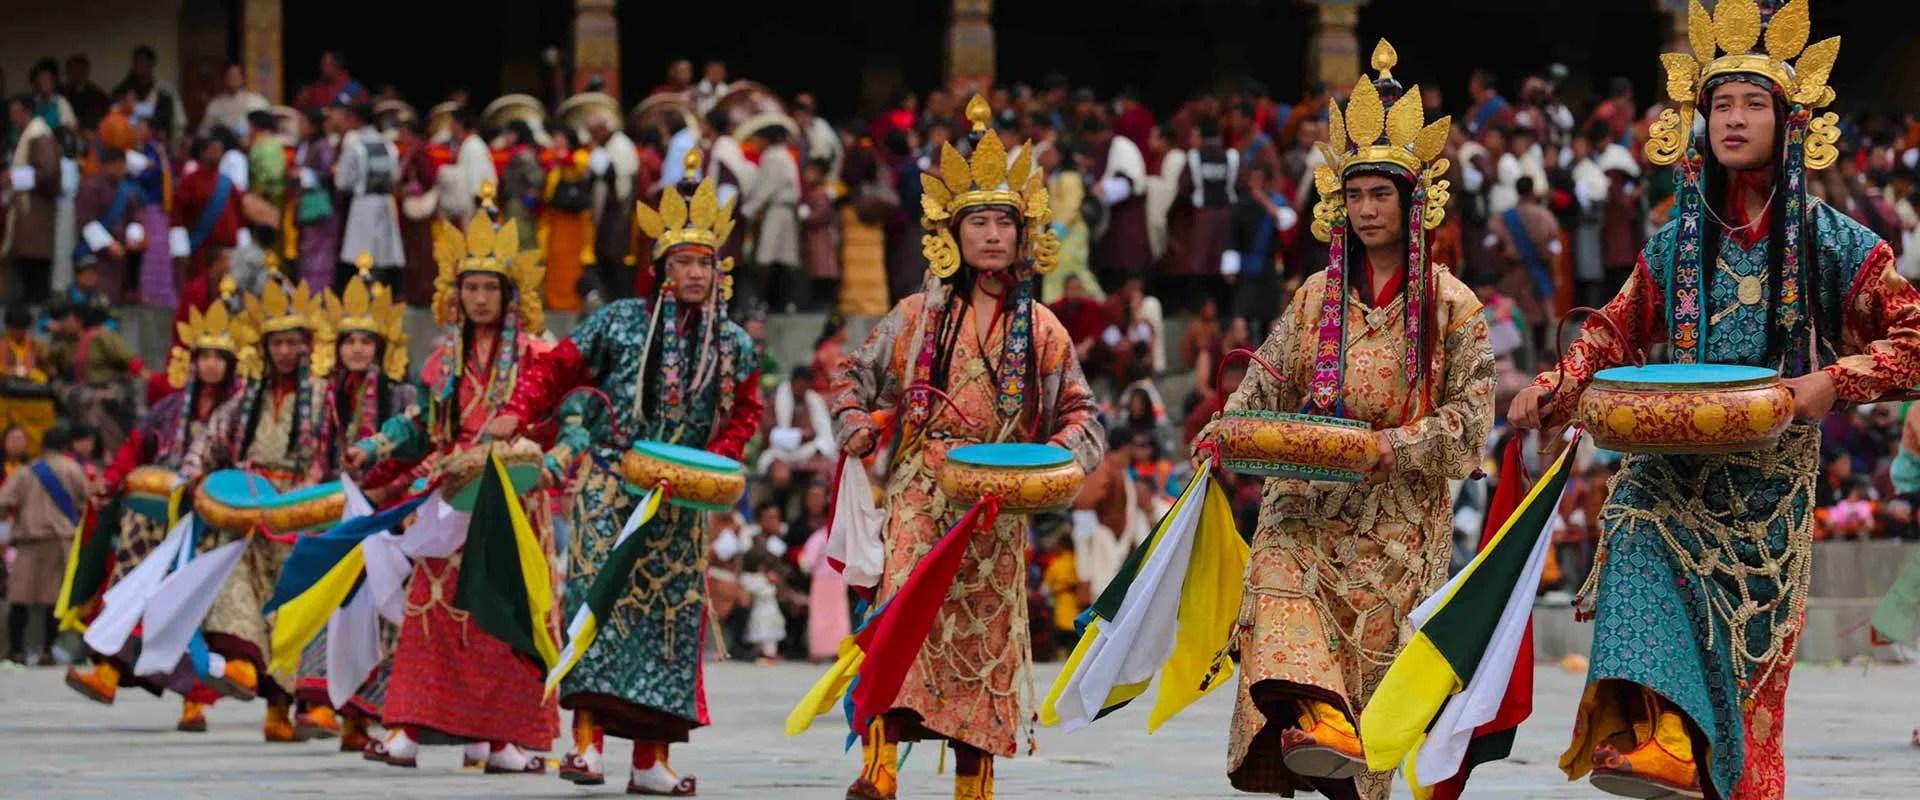 Chorten Kora Tshechu Bhutan festival tour